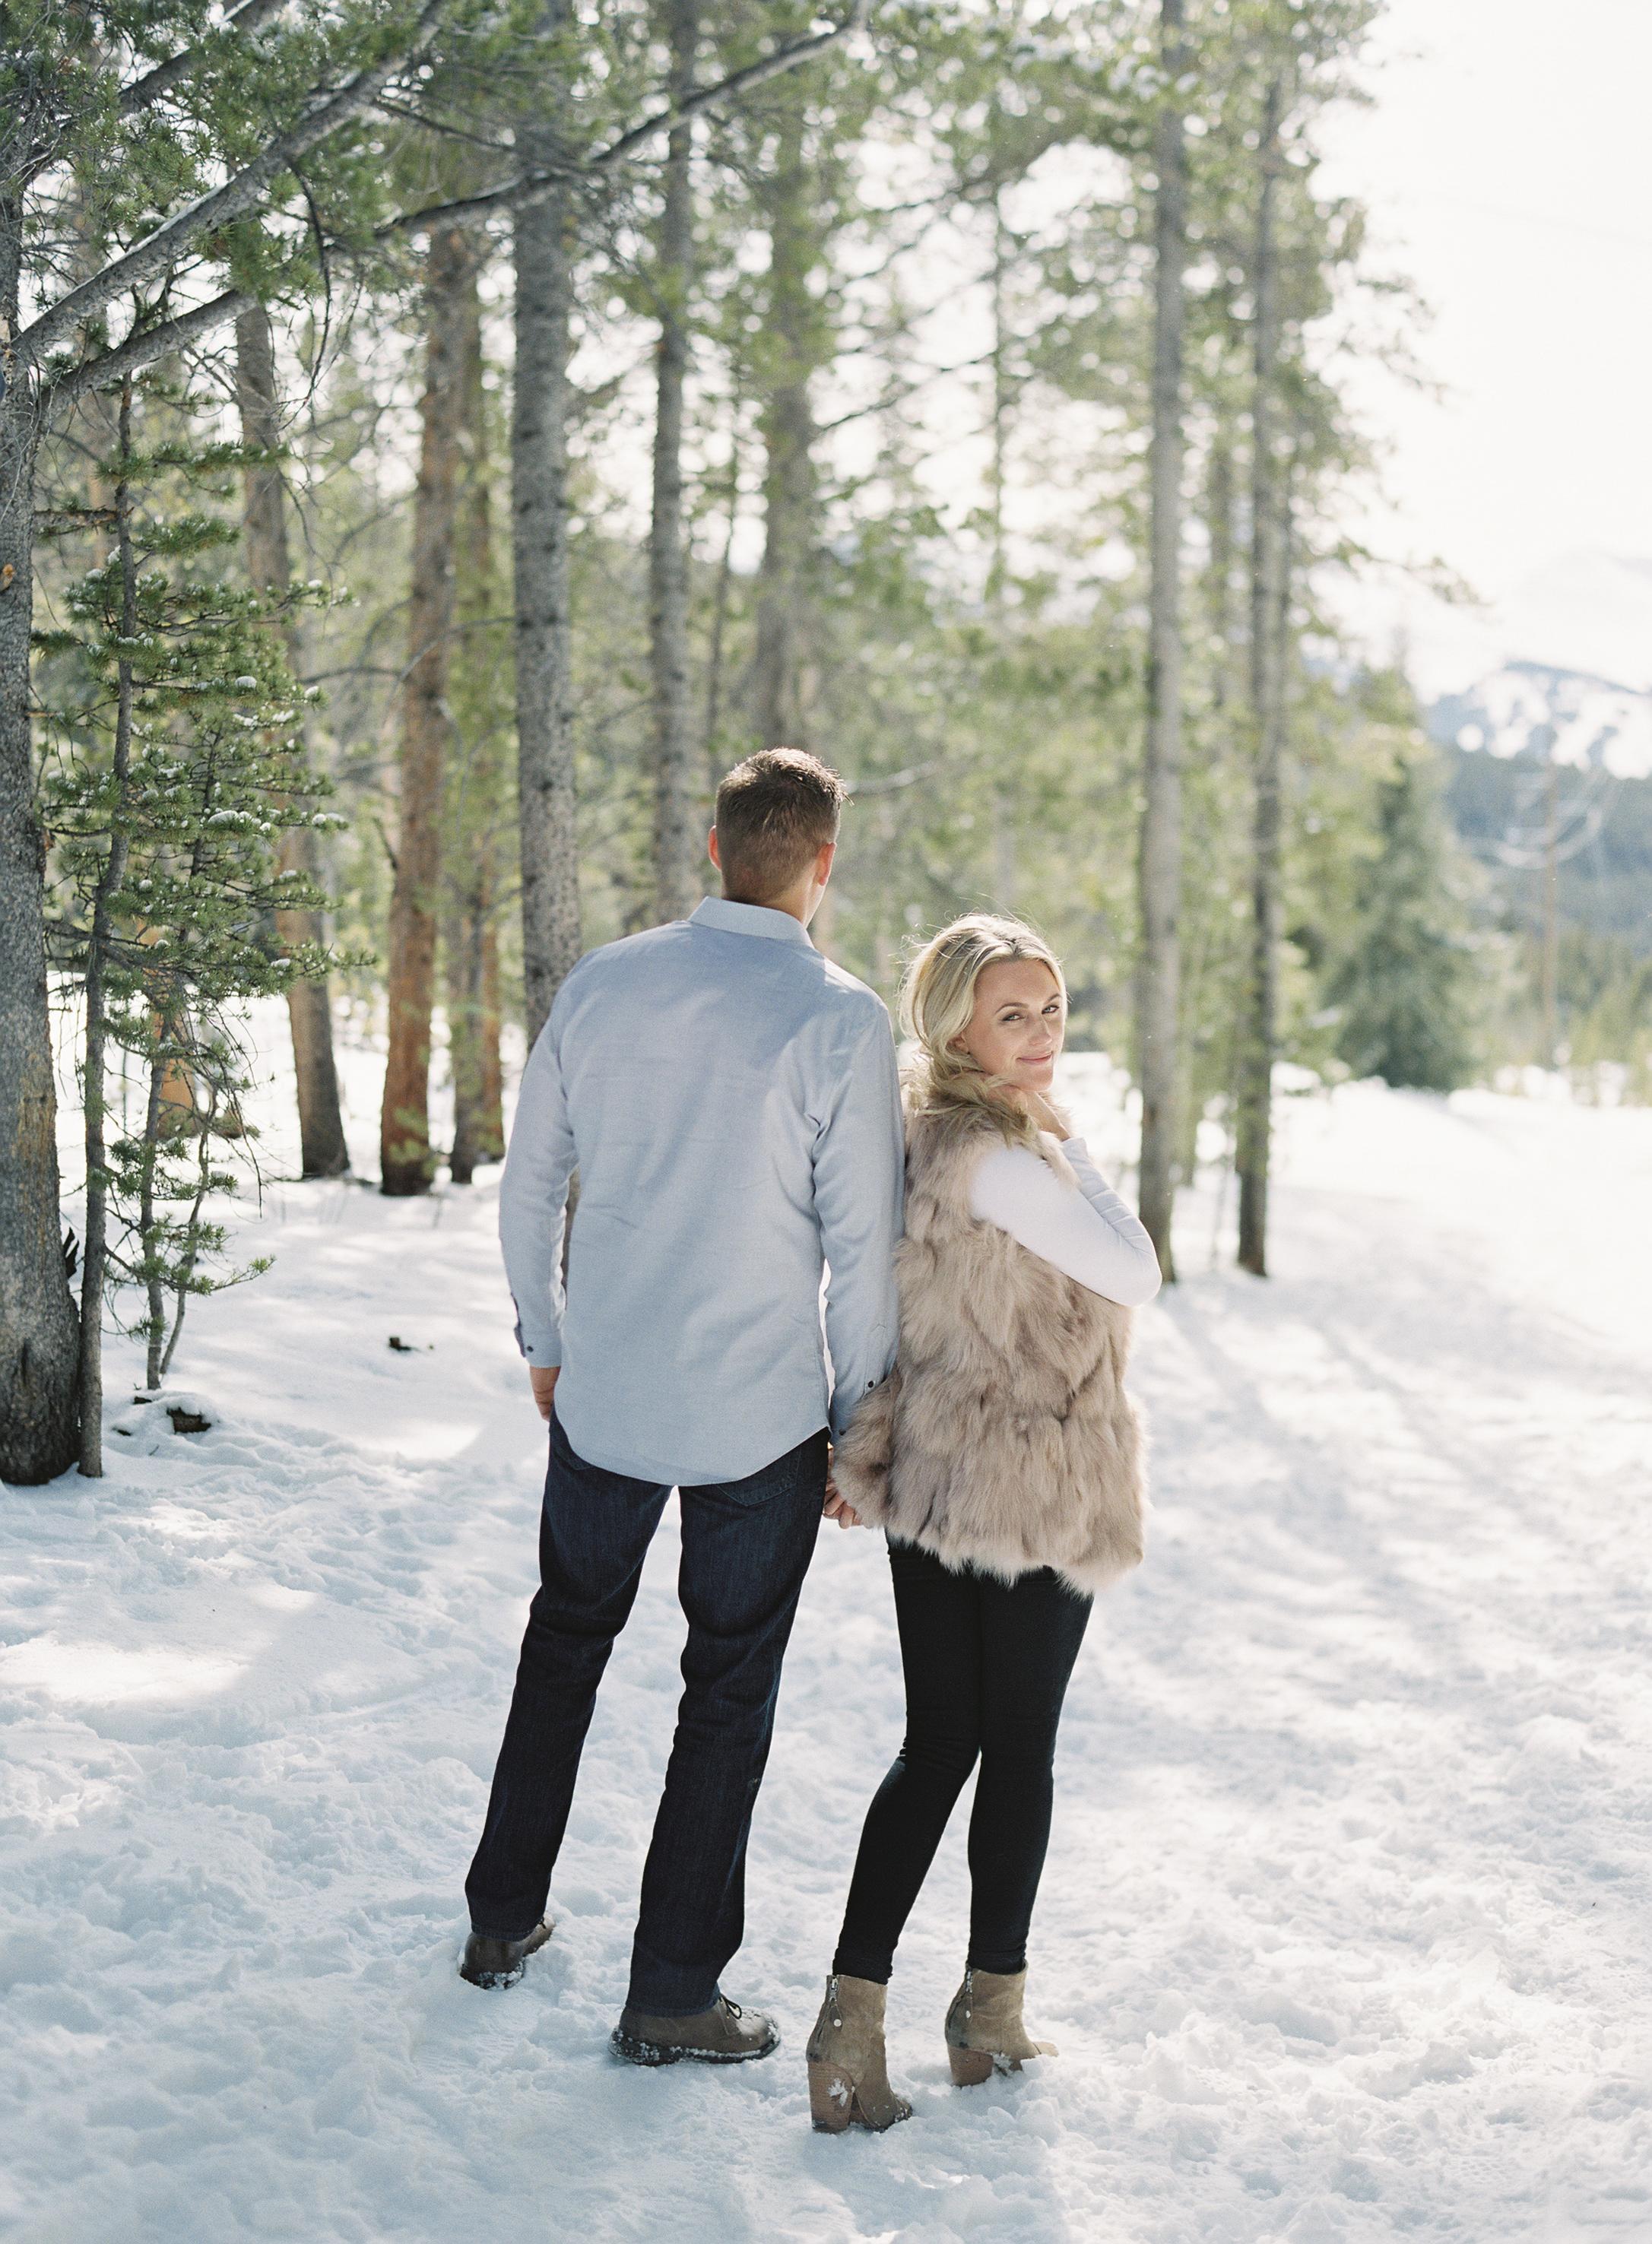 Sarah and John Engaged-Carrie King Photographer30.jpg